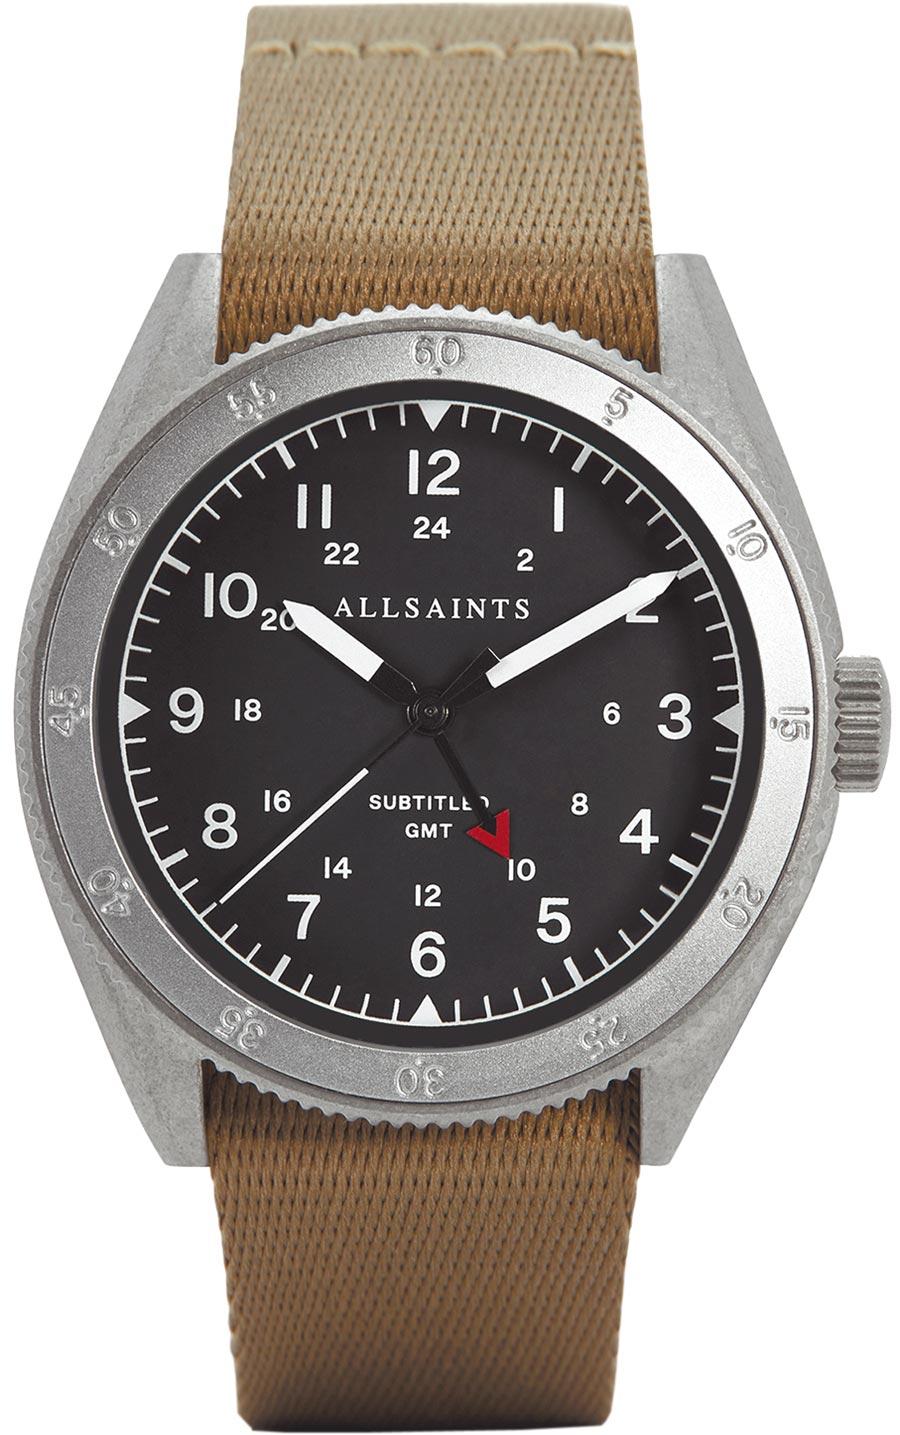 AllSaints SUBTITLED GMT II腕表,7600元。(AllSaints提供)